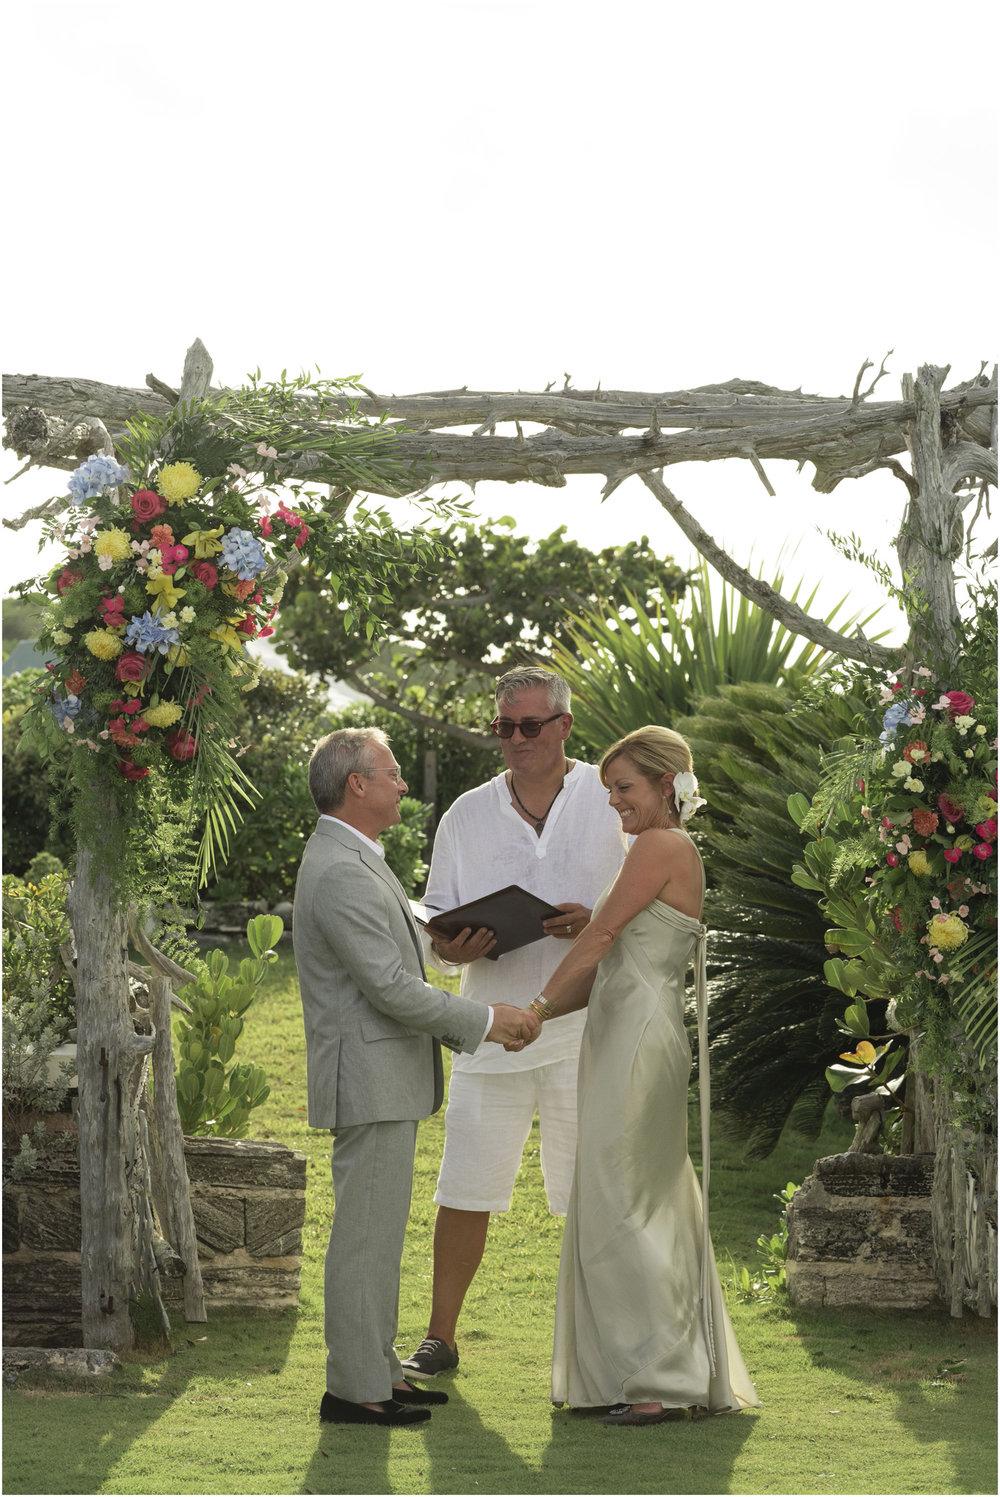 ©FianderFoto_Bermuda_Wedding_Photographer_Long_Island_Bermuda_Nancy_Ray_067.jpg